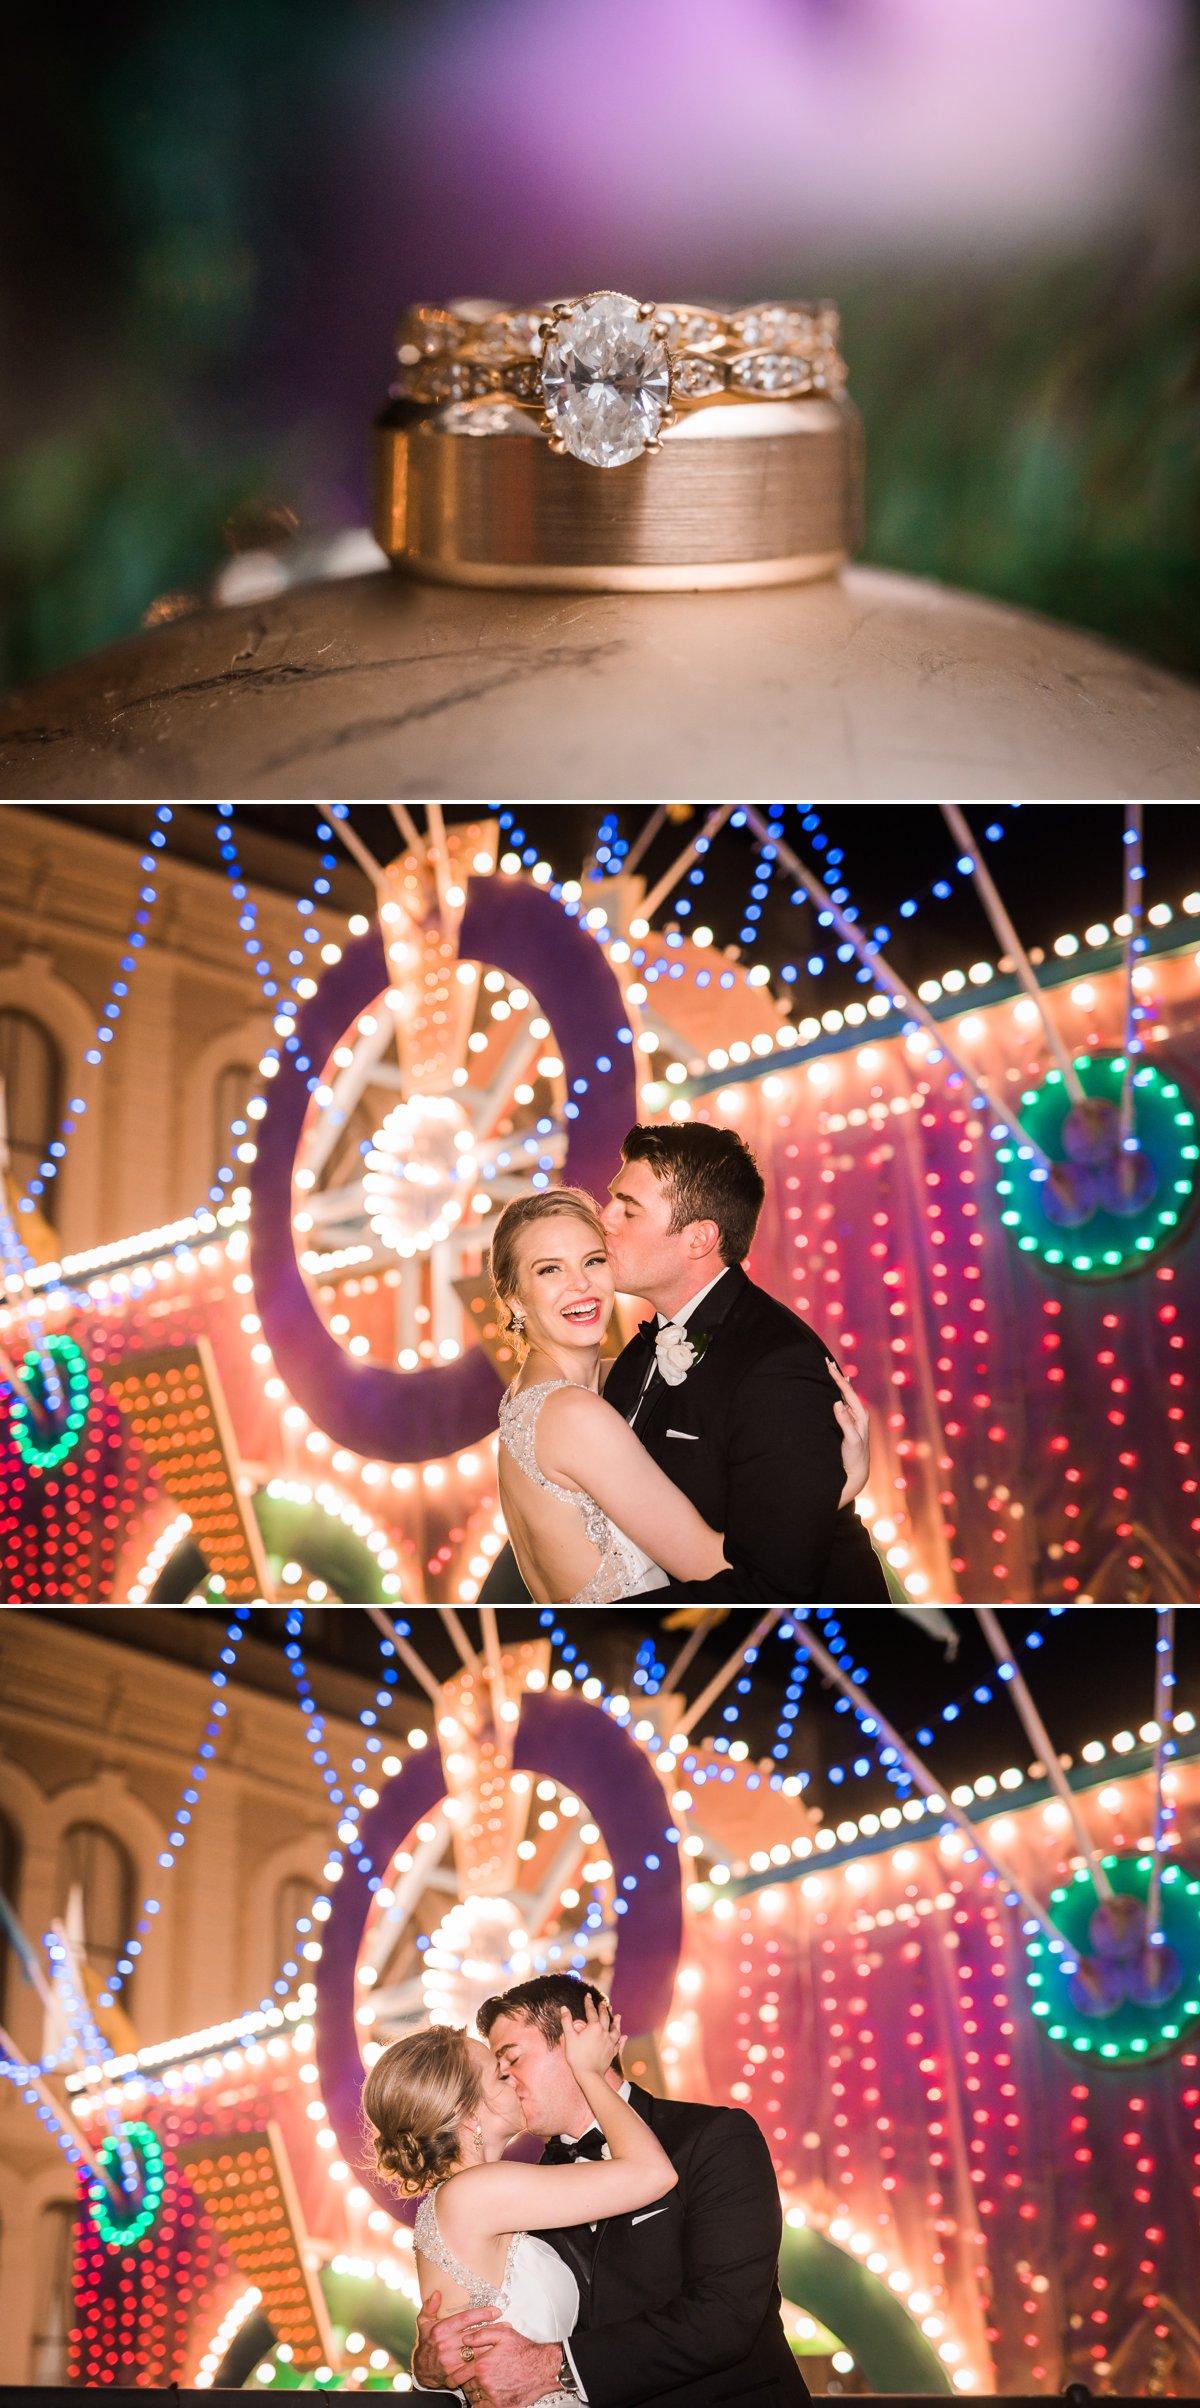 Lauren & Bryan Wedding Night Photos